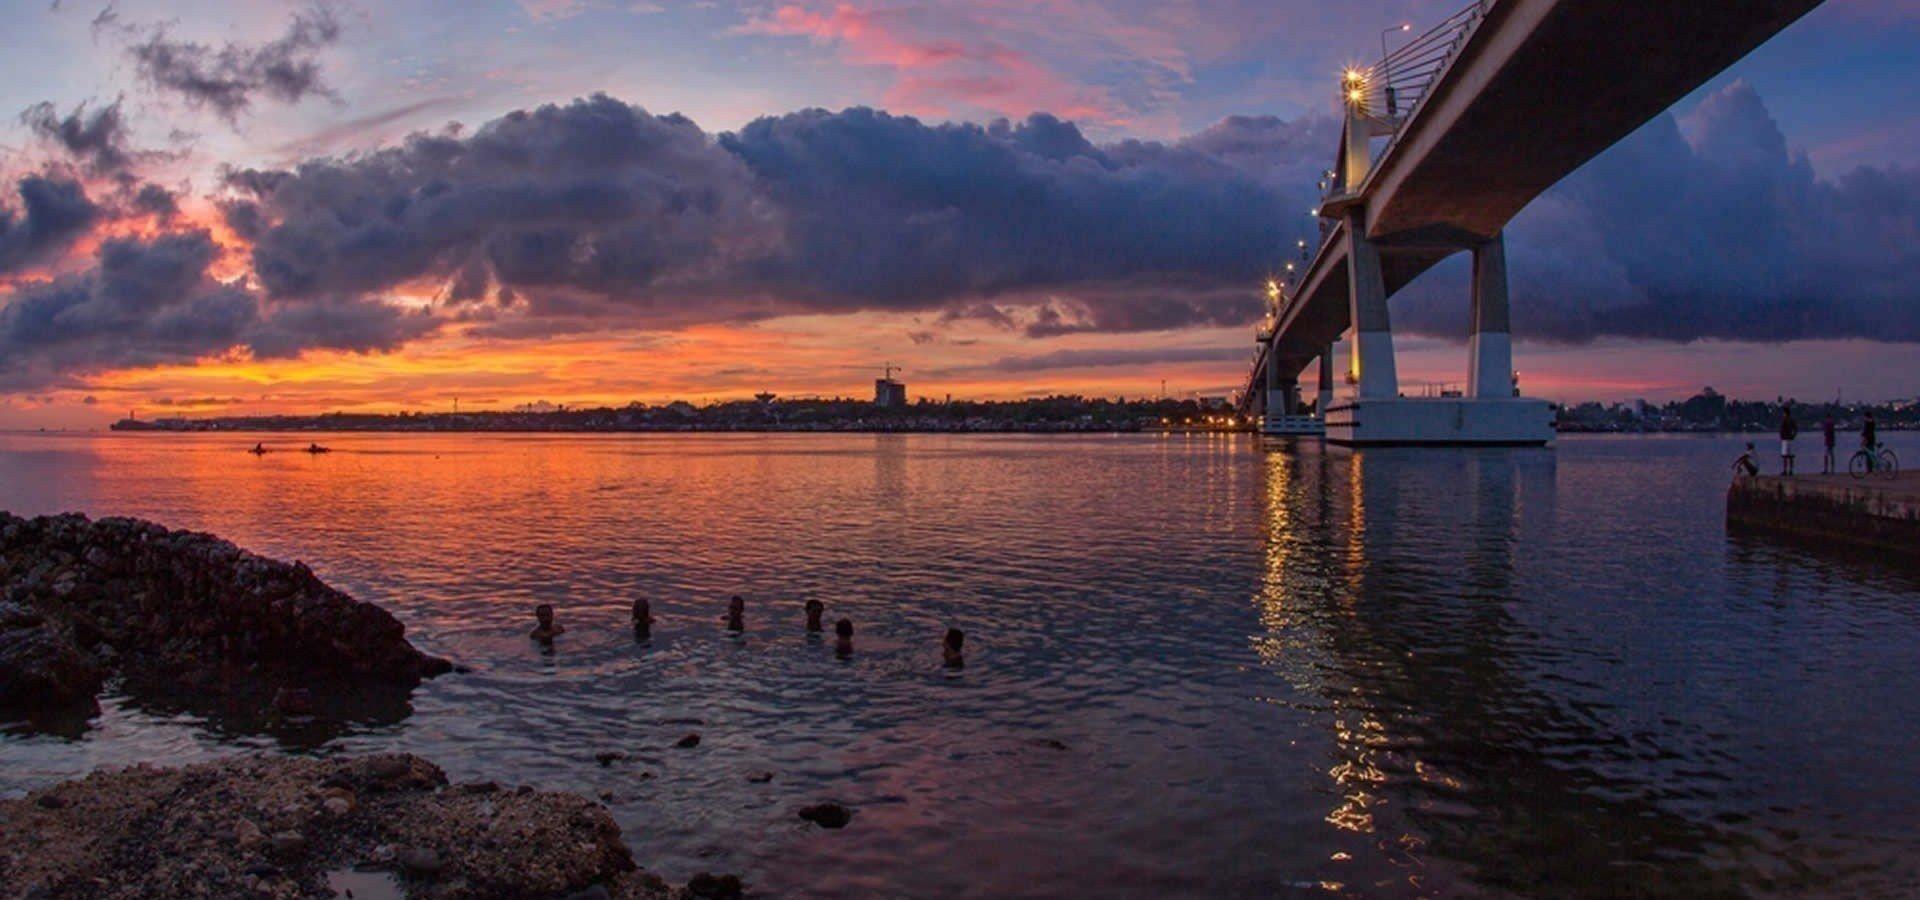 Breathtaking view of Mactan Bridge which connects Cebu City to Mactan Island